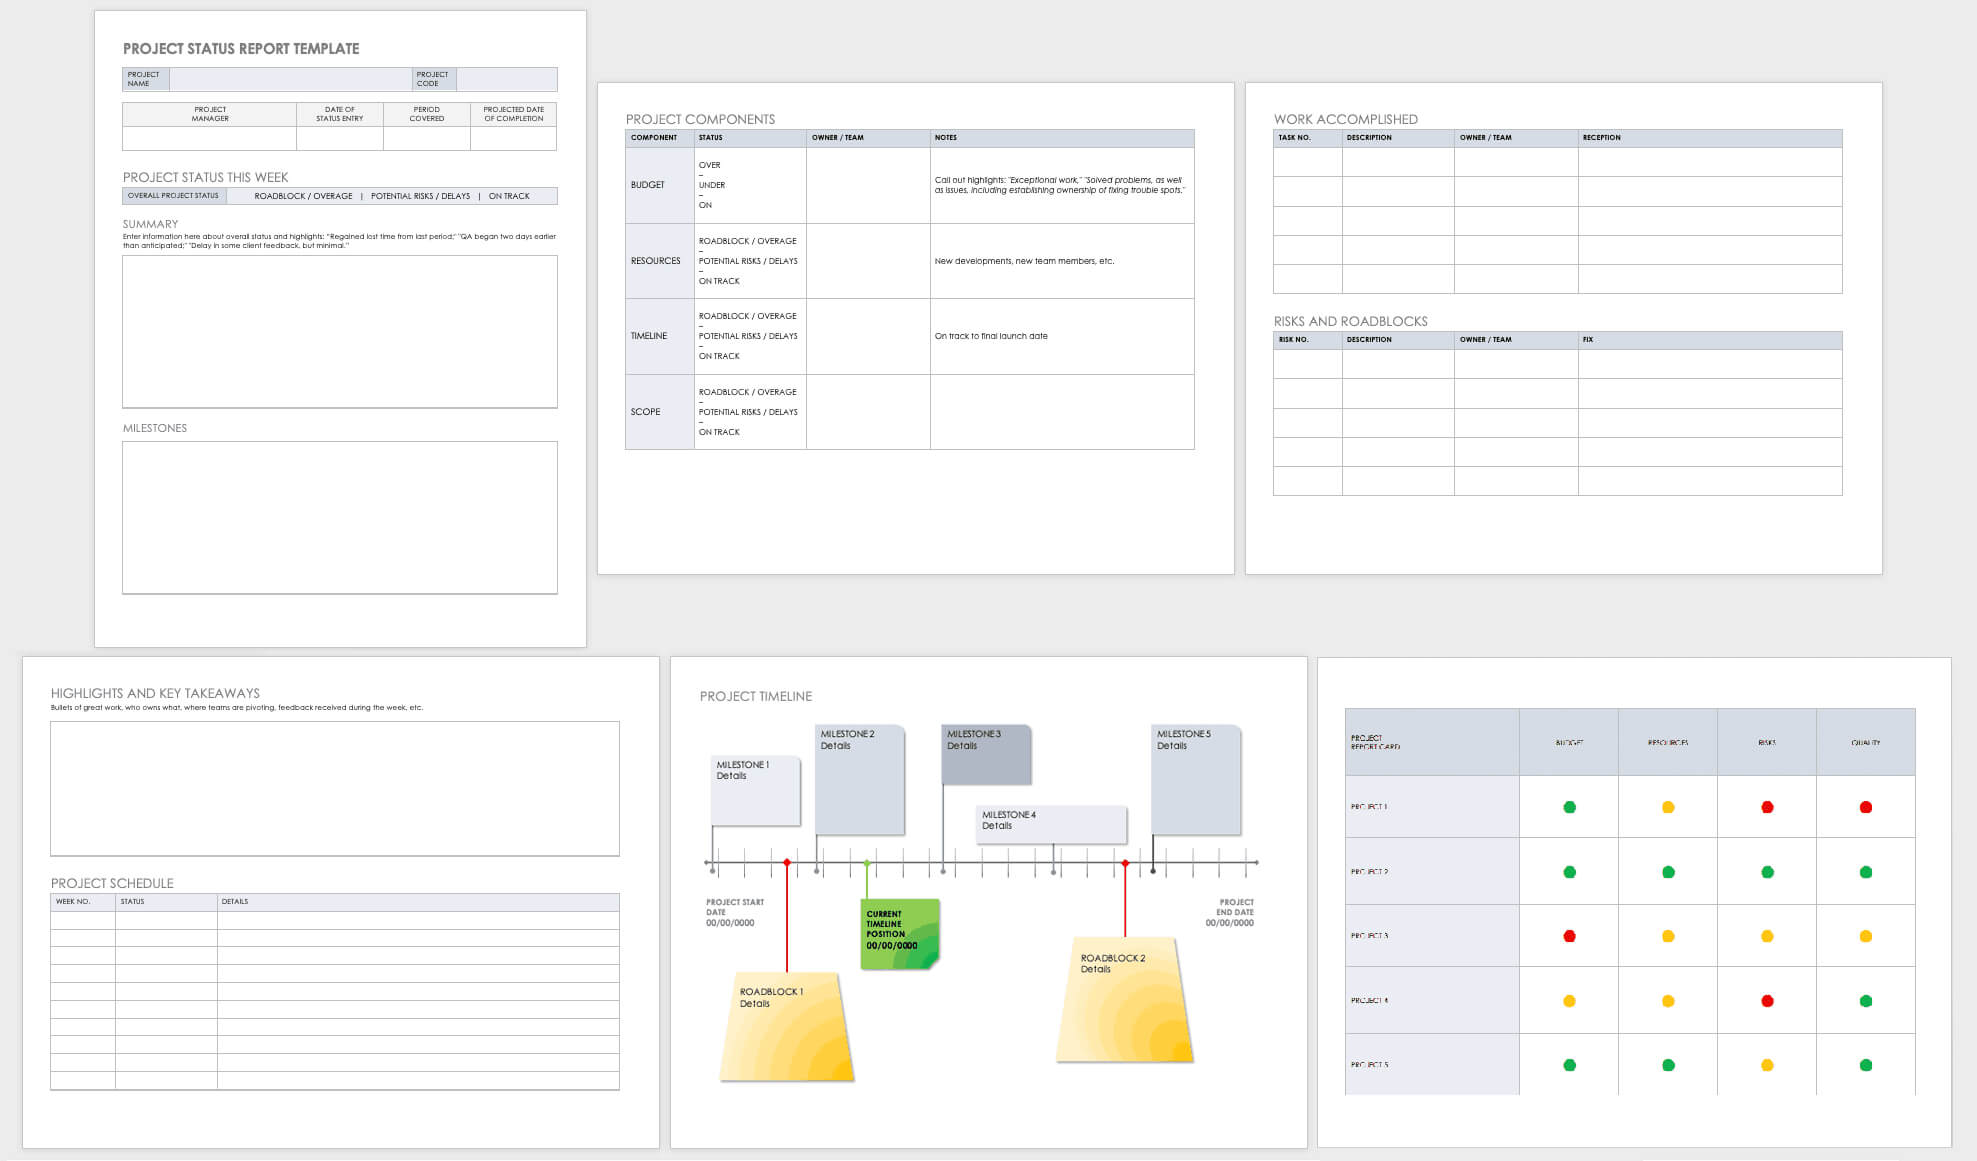 Free Project Report Templates | Smartsheet Pertaining To Project Manager Status Report Template